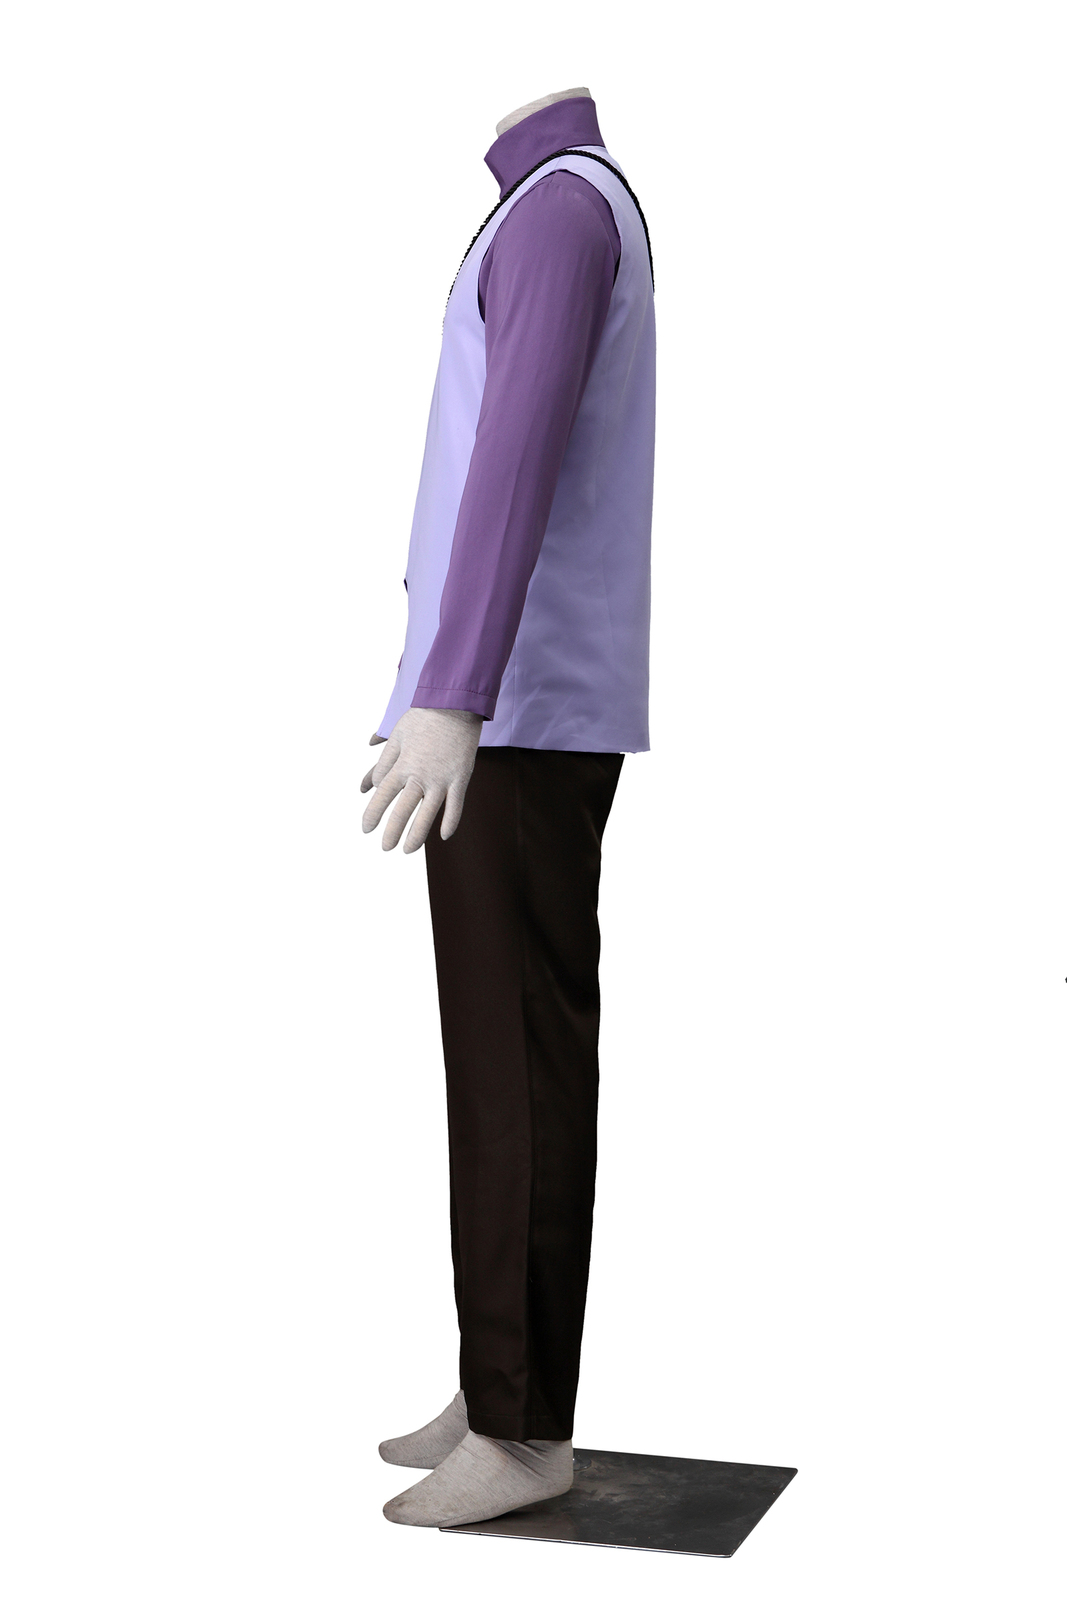 Naruto Boruto Uchiha Sasuke Cosplay Costume Partywear Full Set